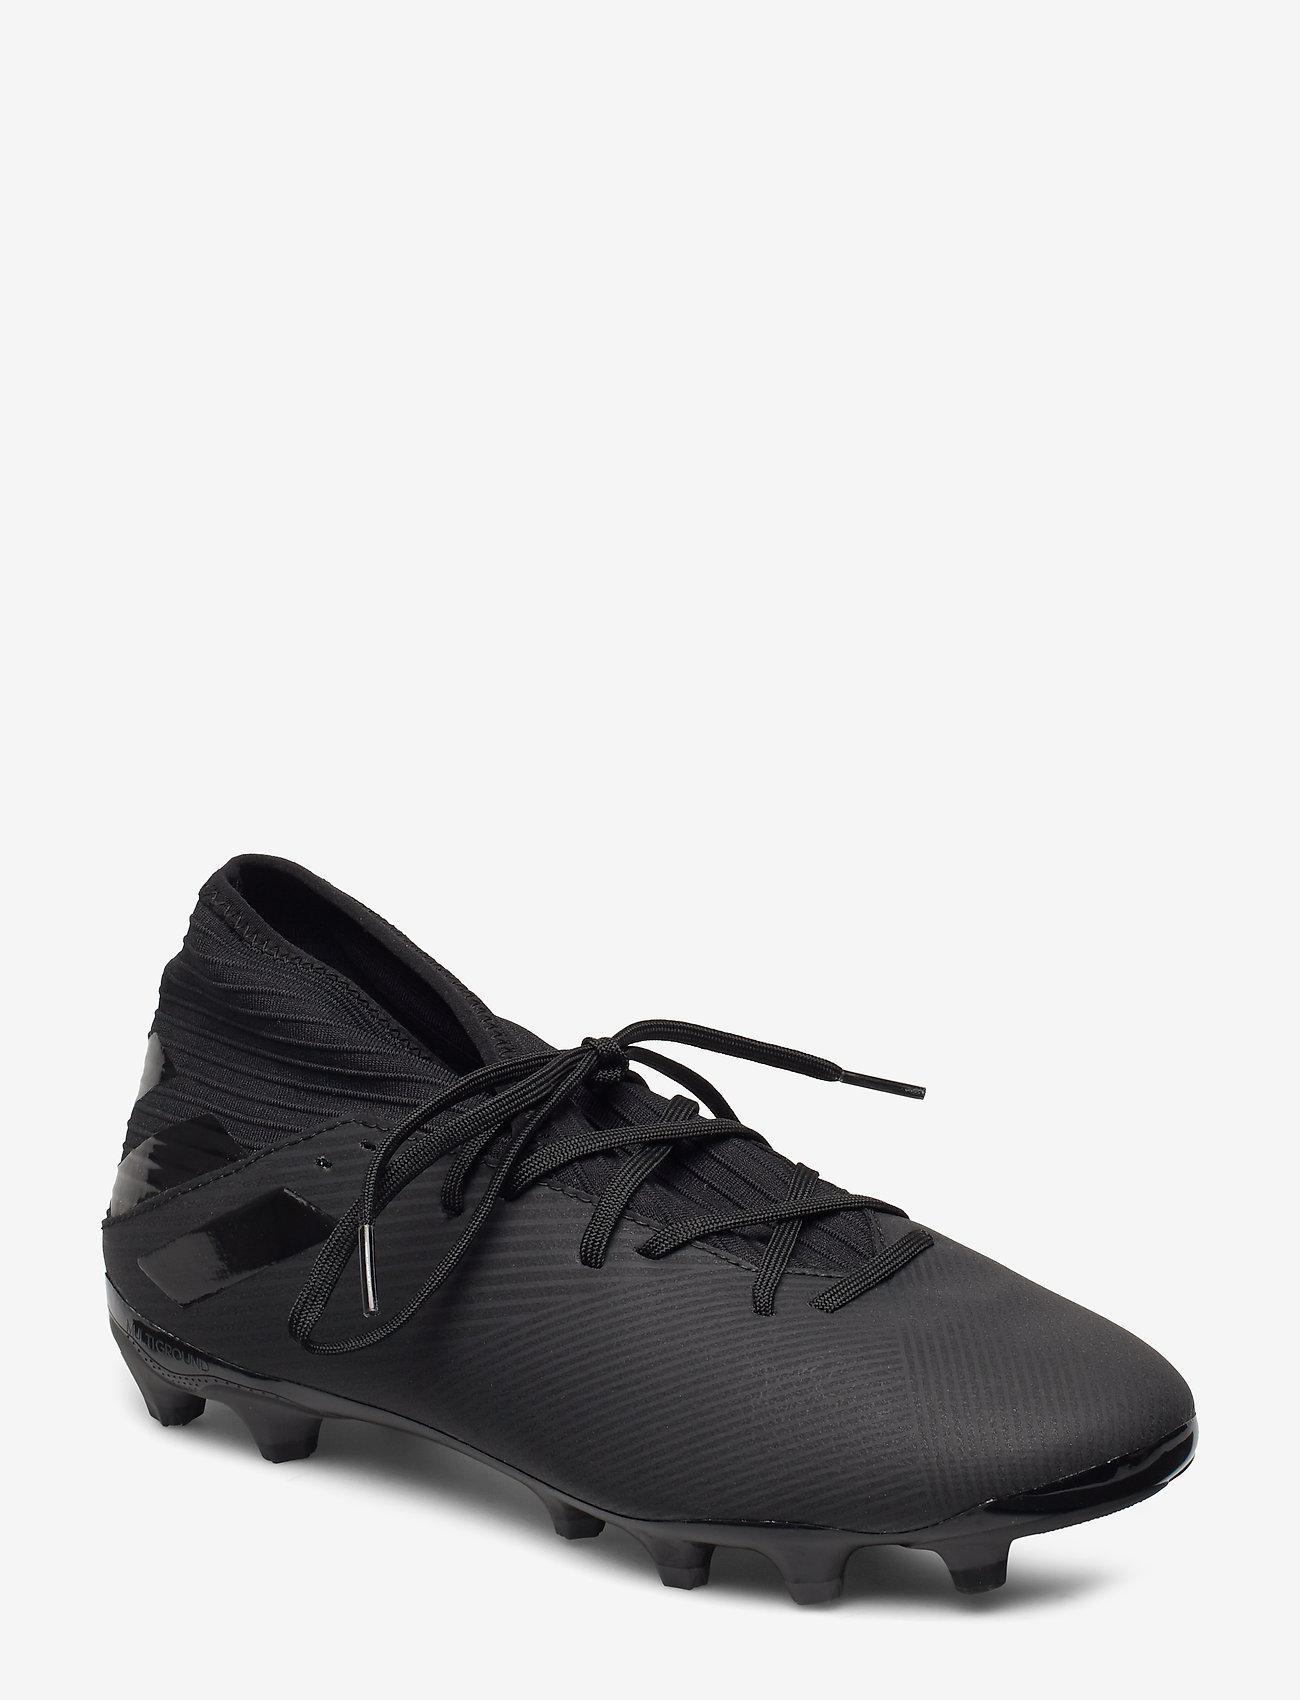 adidas Performance - NEMEZIZ 19.3 MG - jalkapallokengät - cblack/cblack/utiblk - 0